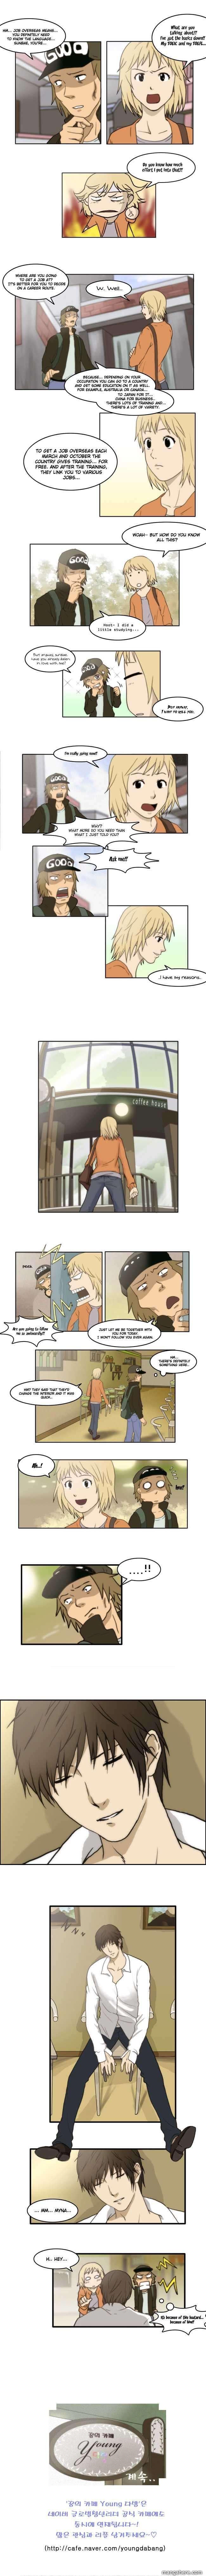 Cafe Of Dreams 3 Page 2